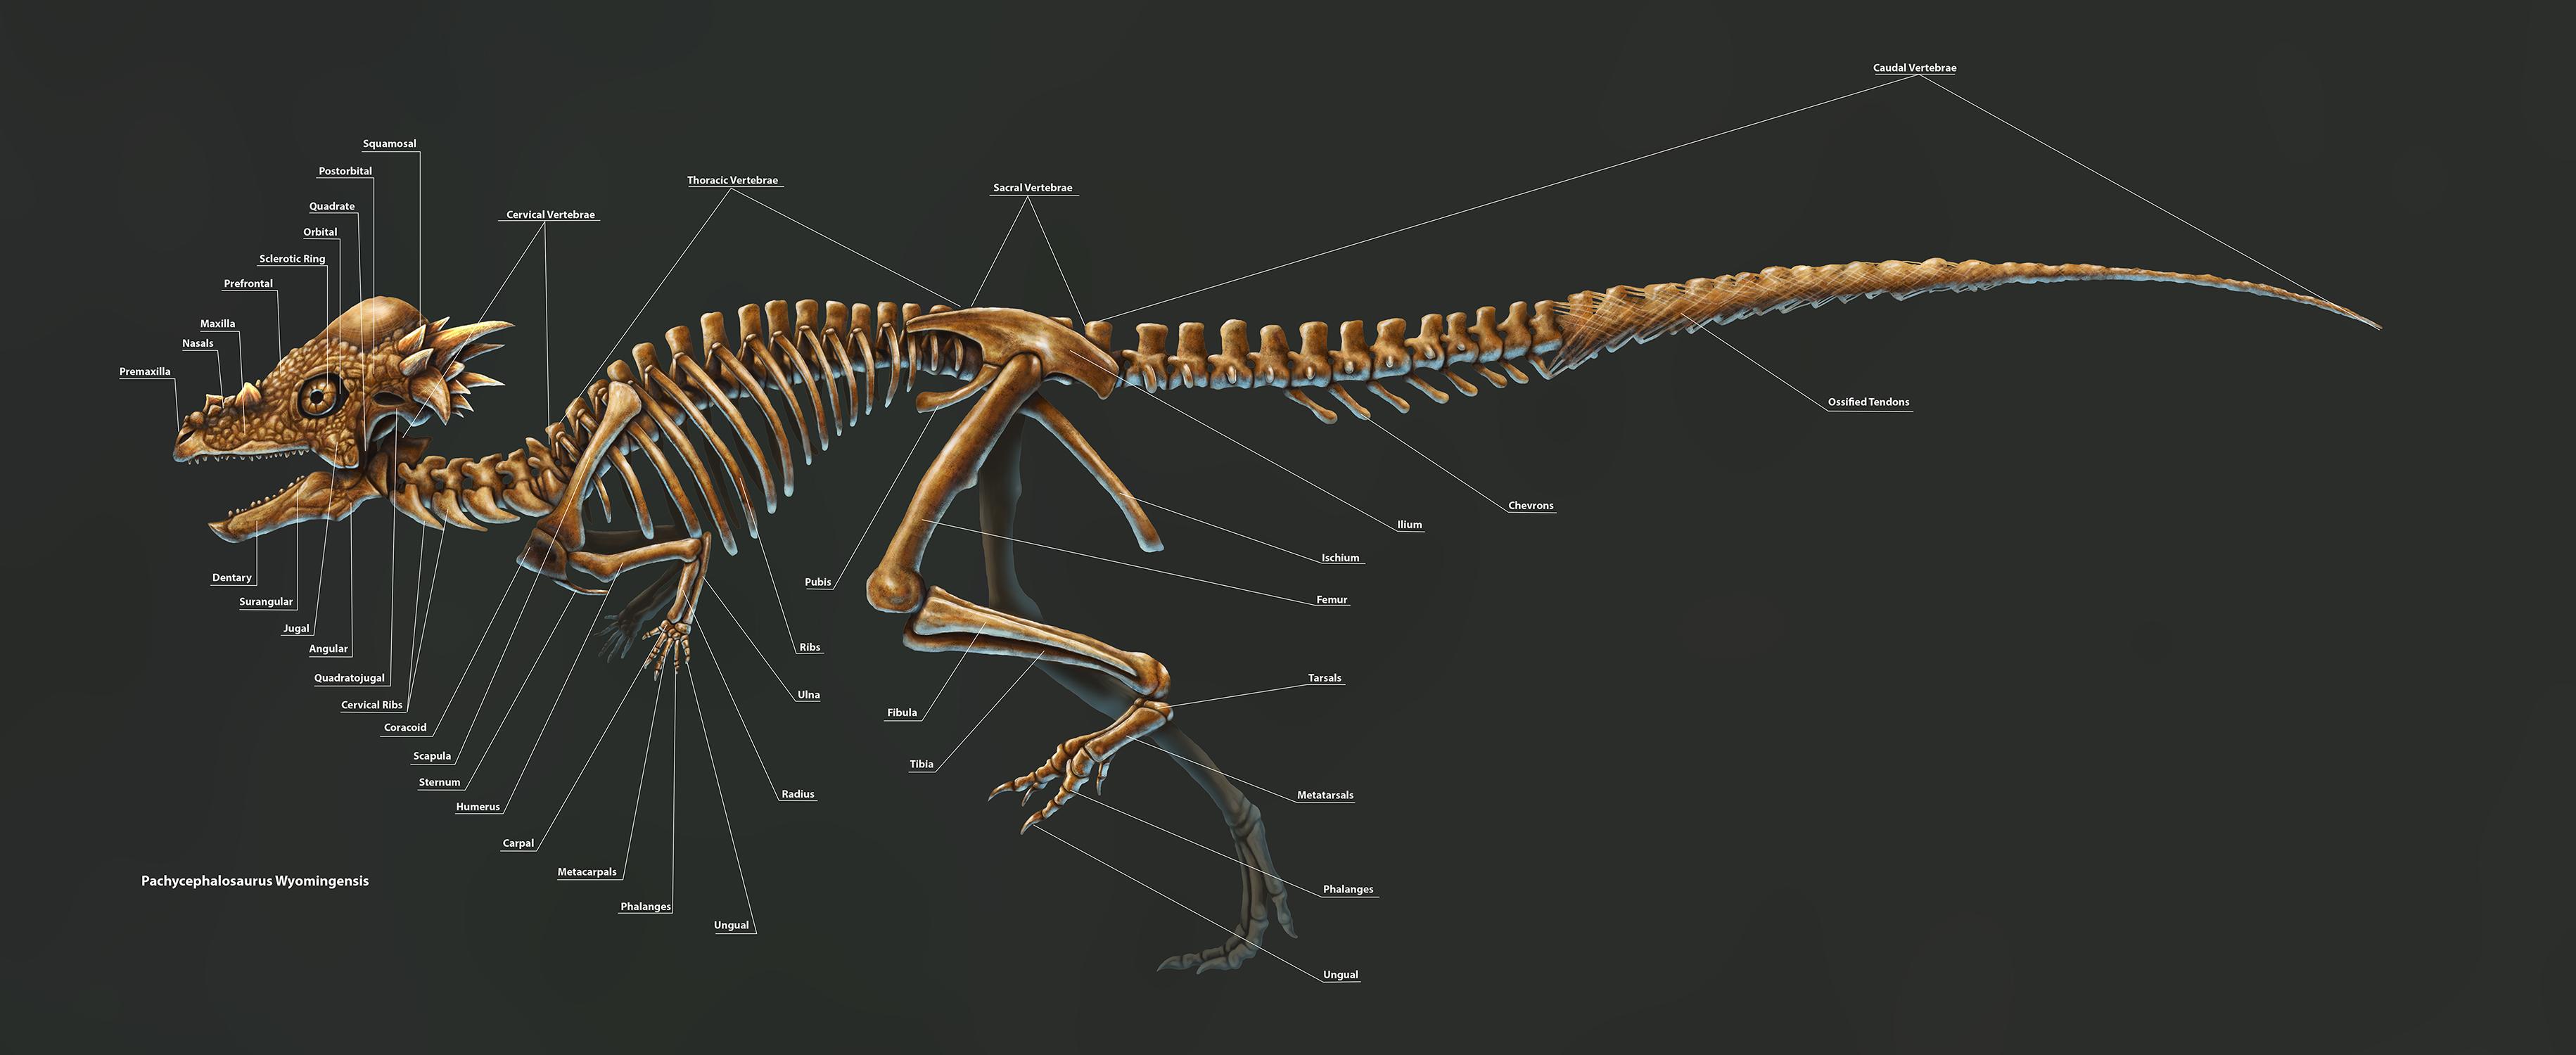 pachycephalosauruswyomingensislabels